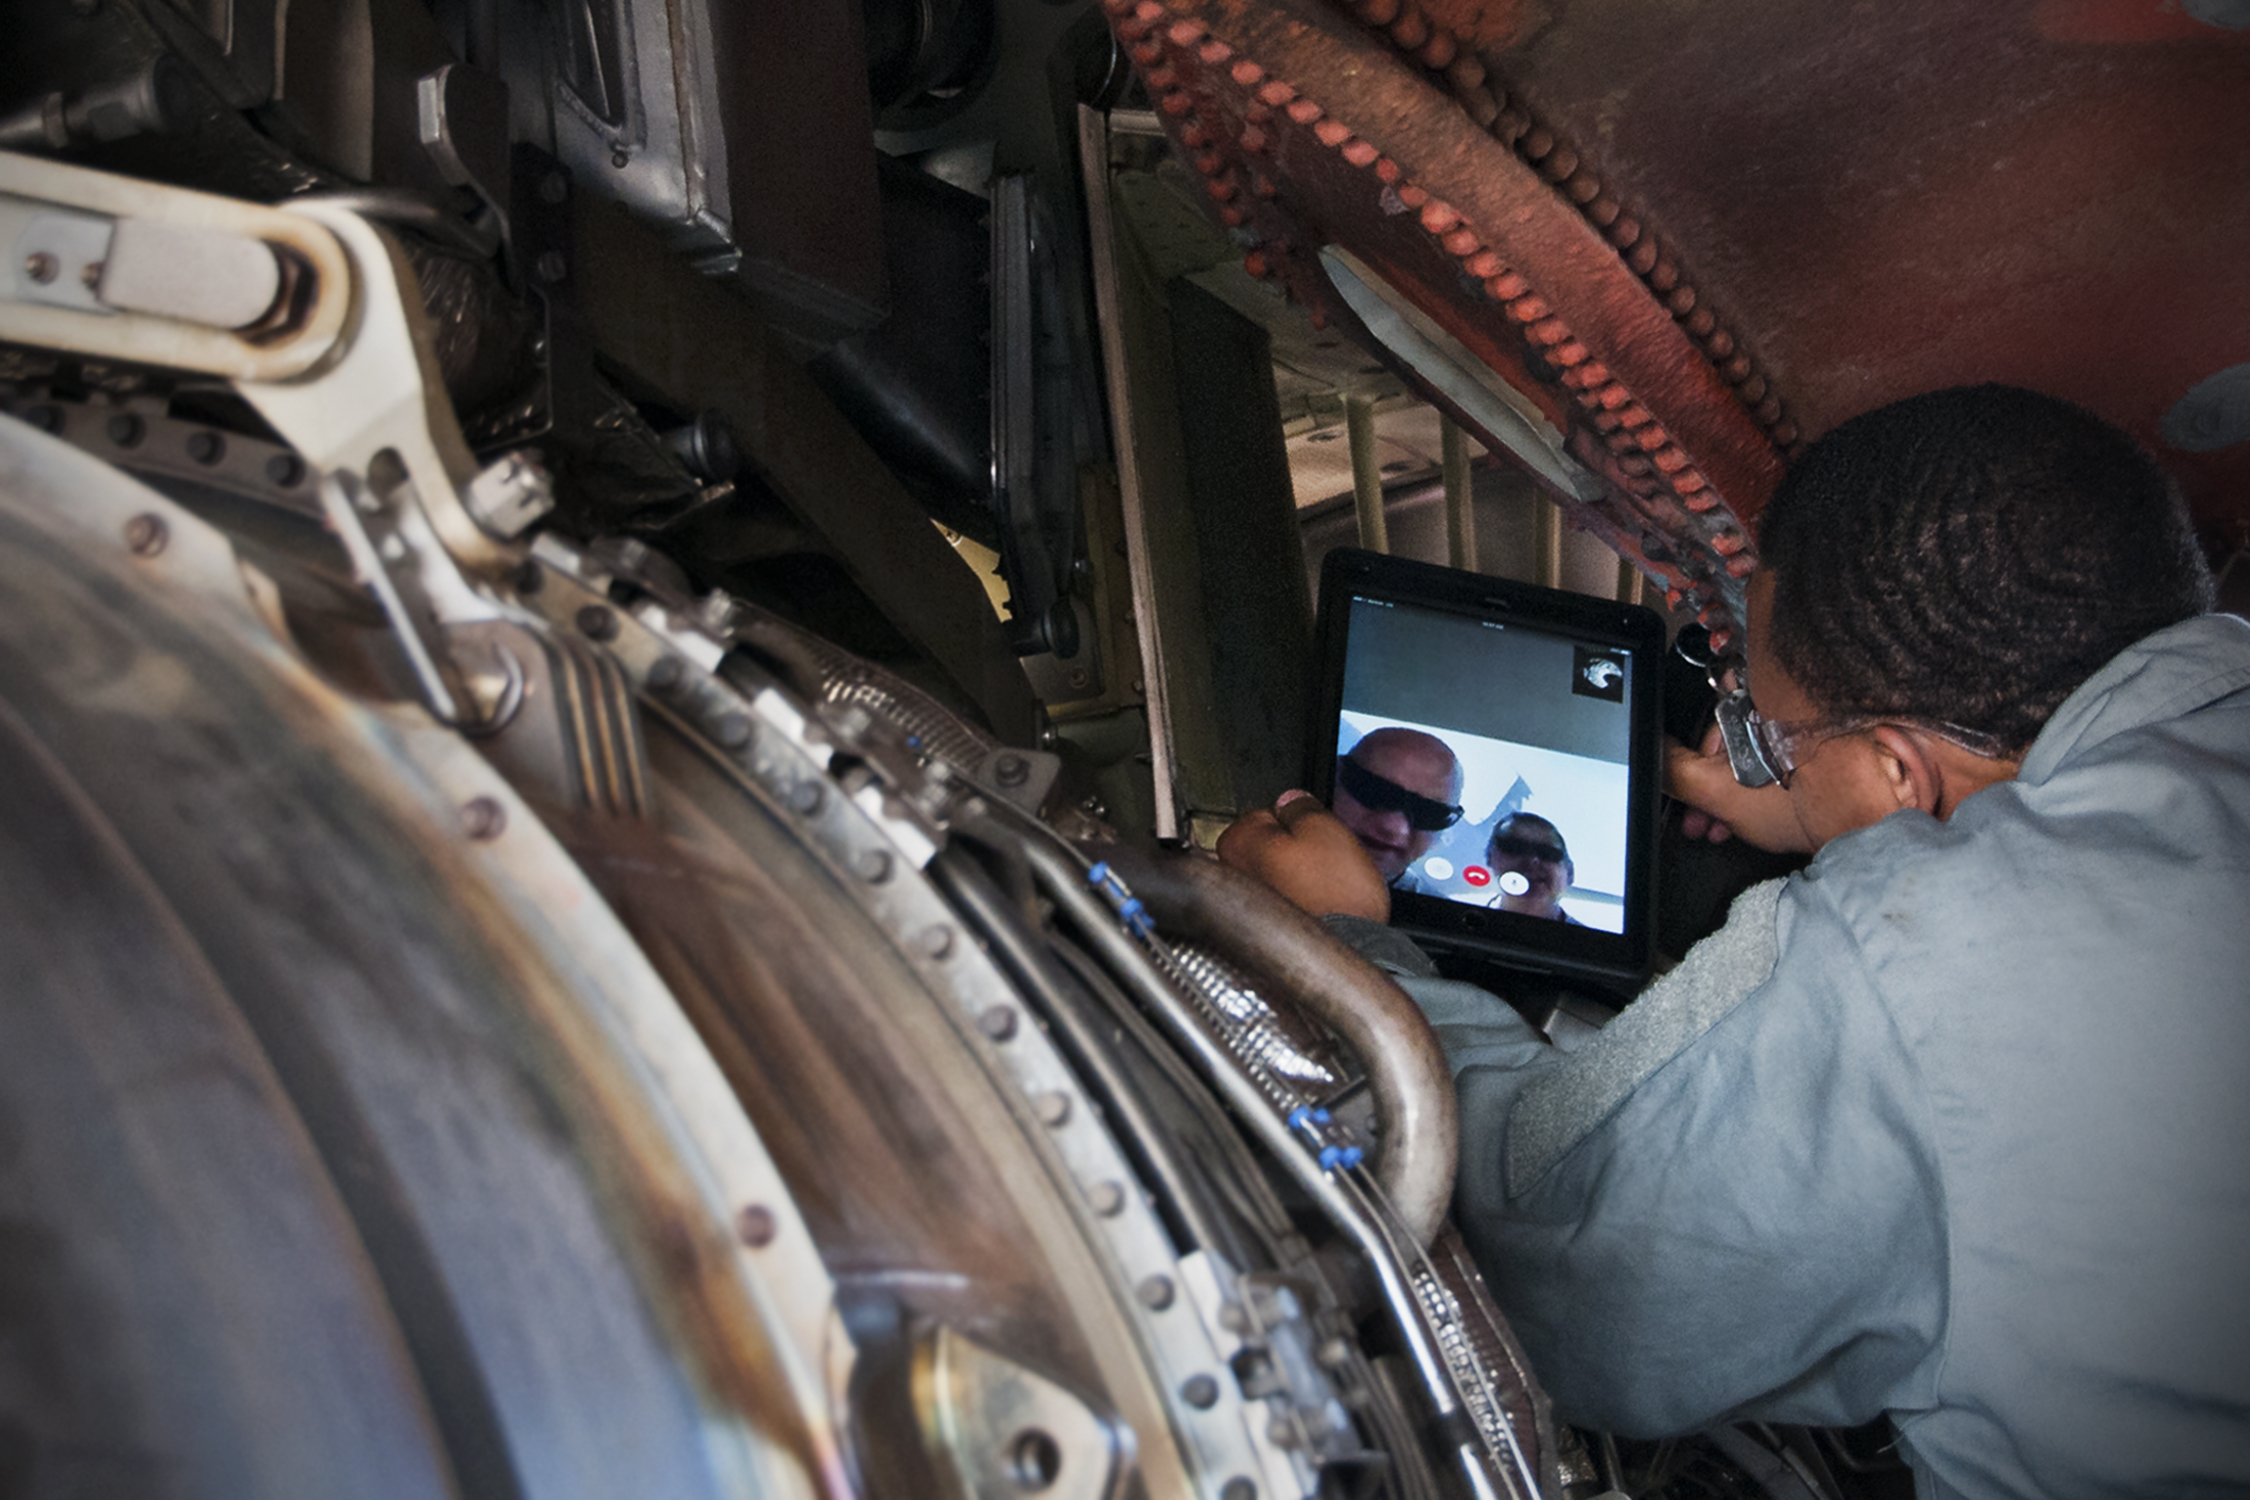 459th maintenance group aerospace propulsion jet engine mechanic